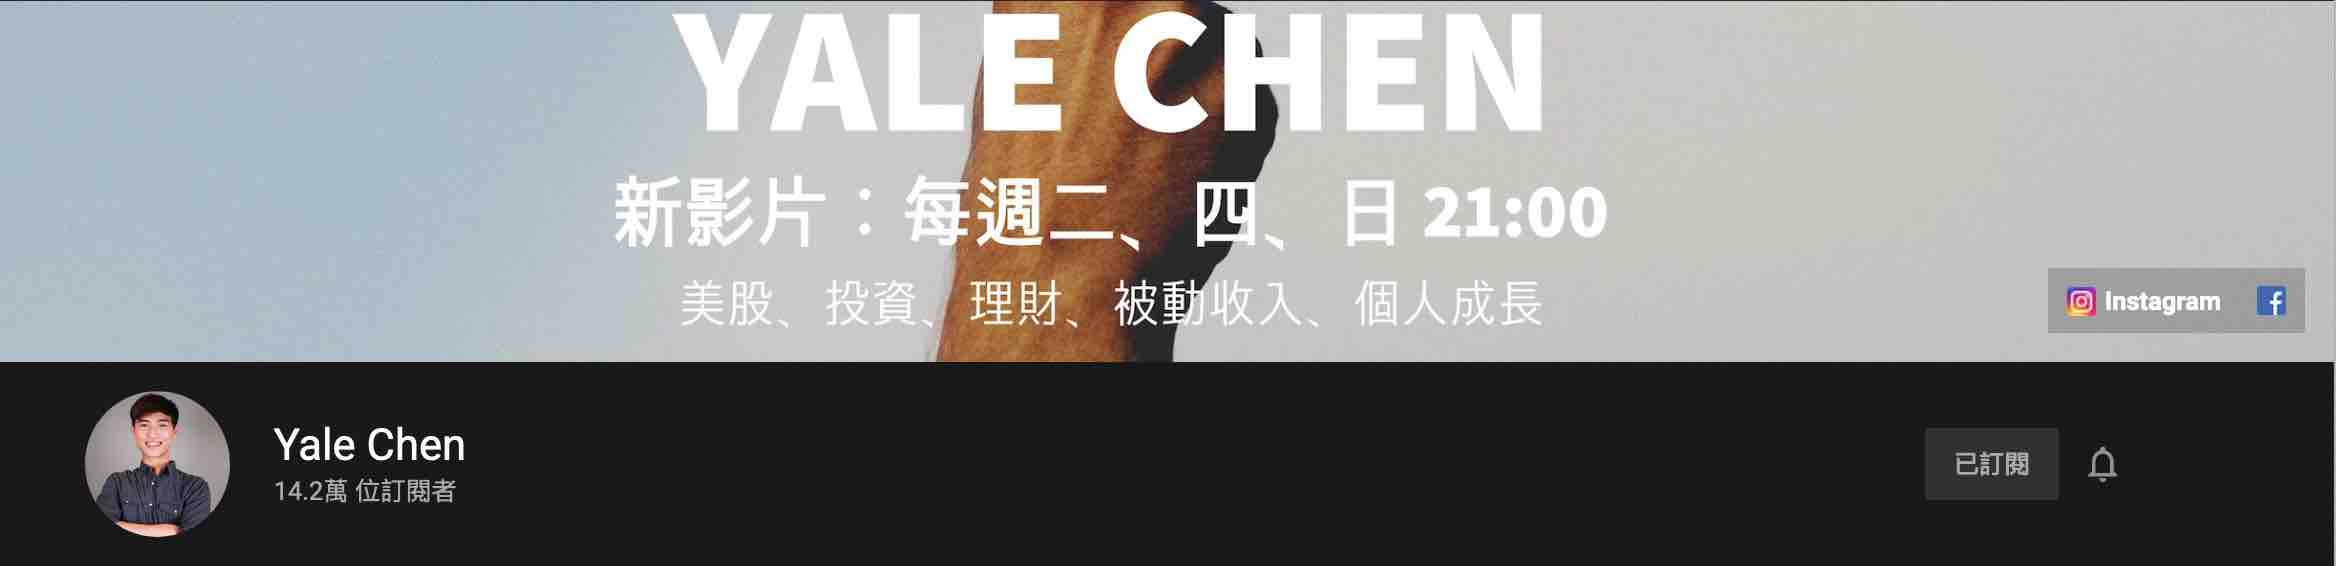 yale-chen-youtube